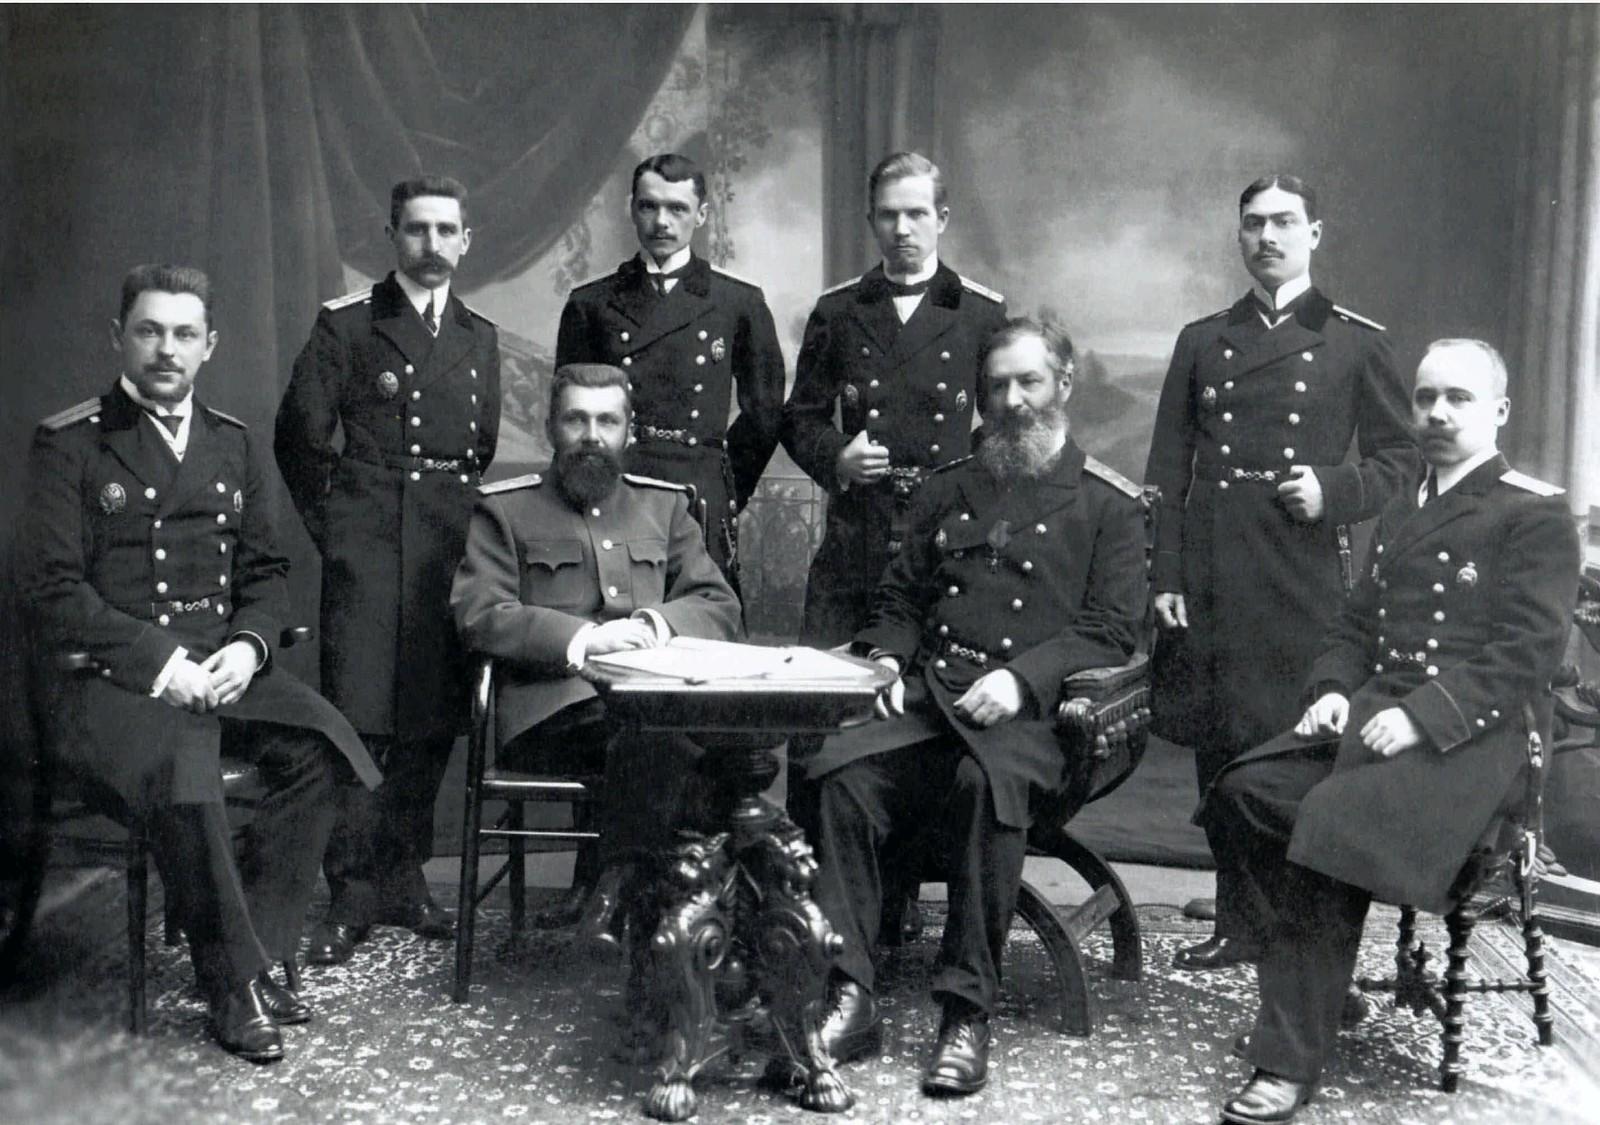 1910-е. Инженеры-судостроители И.Г.Бубнов и А.Н.Крылов с преподавателями Морской академии